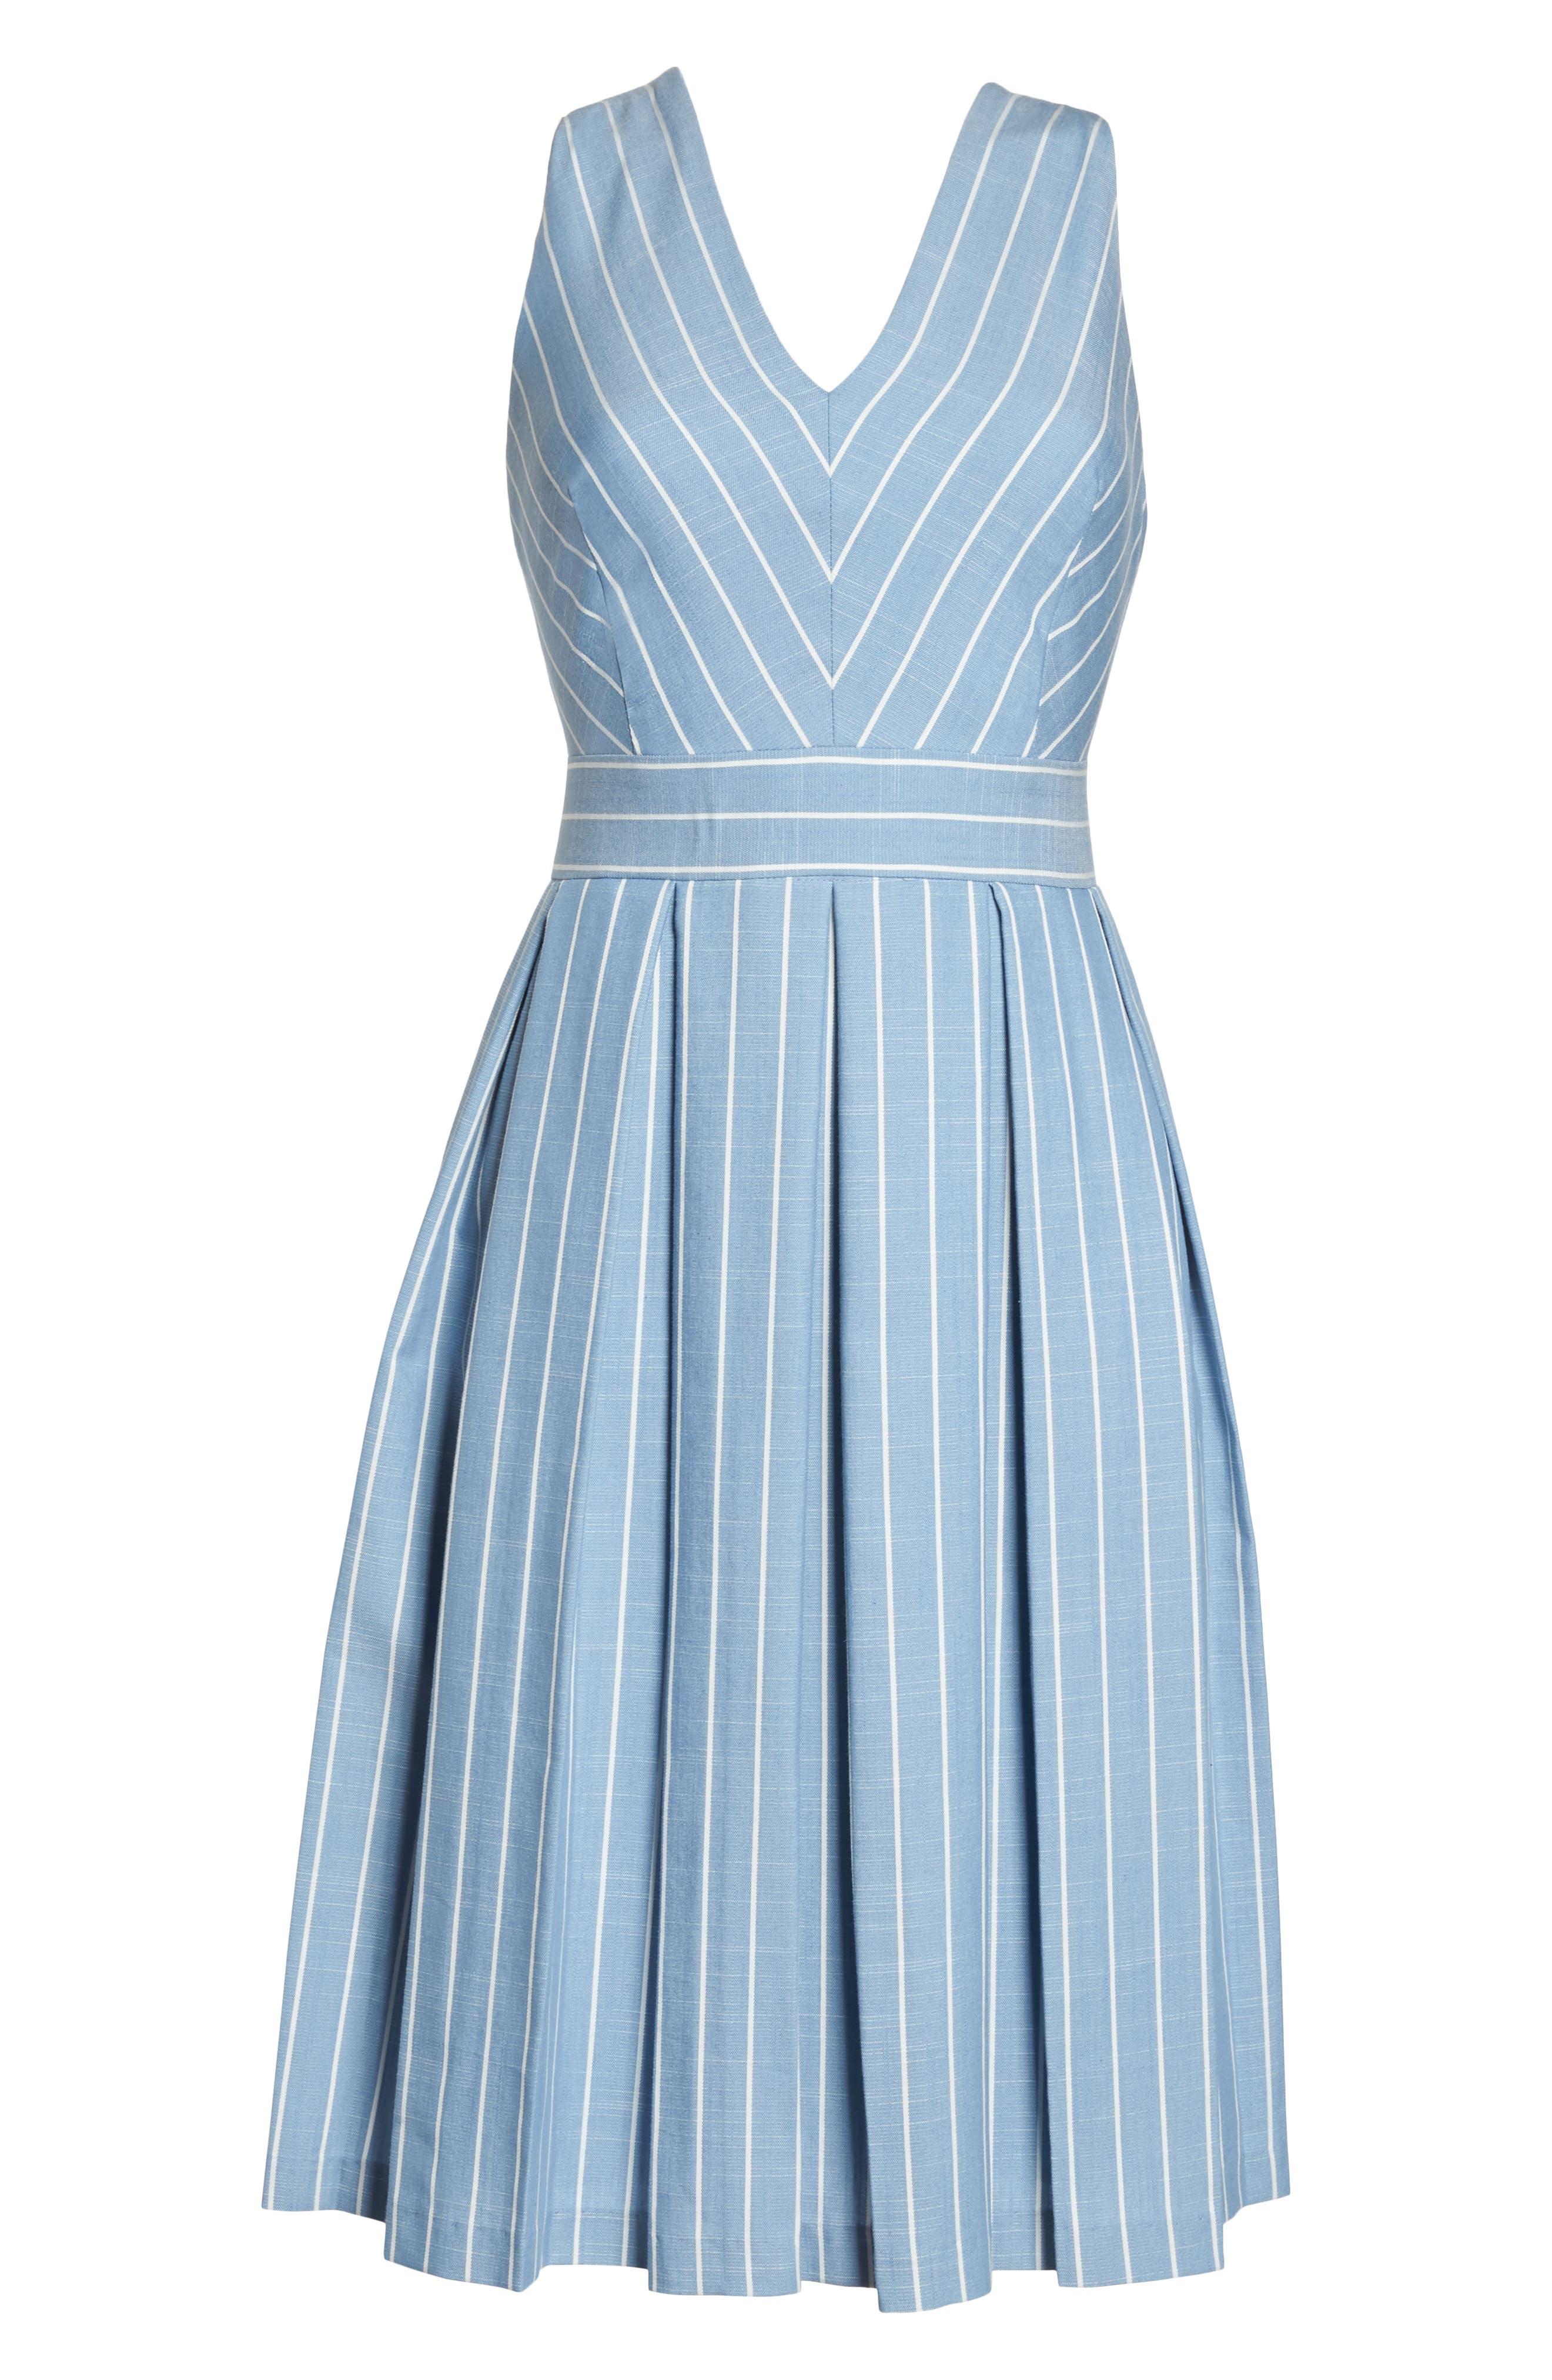 Samantha Slub Stripe Fit & Flare Dress,                             Alternate thumbnail 8, color,                             460